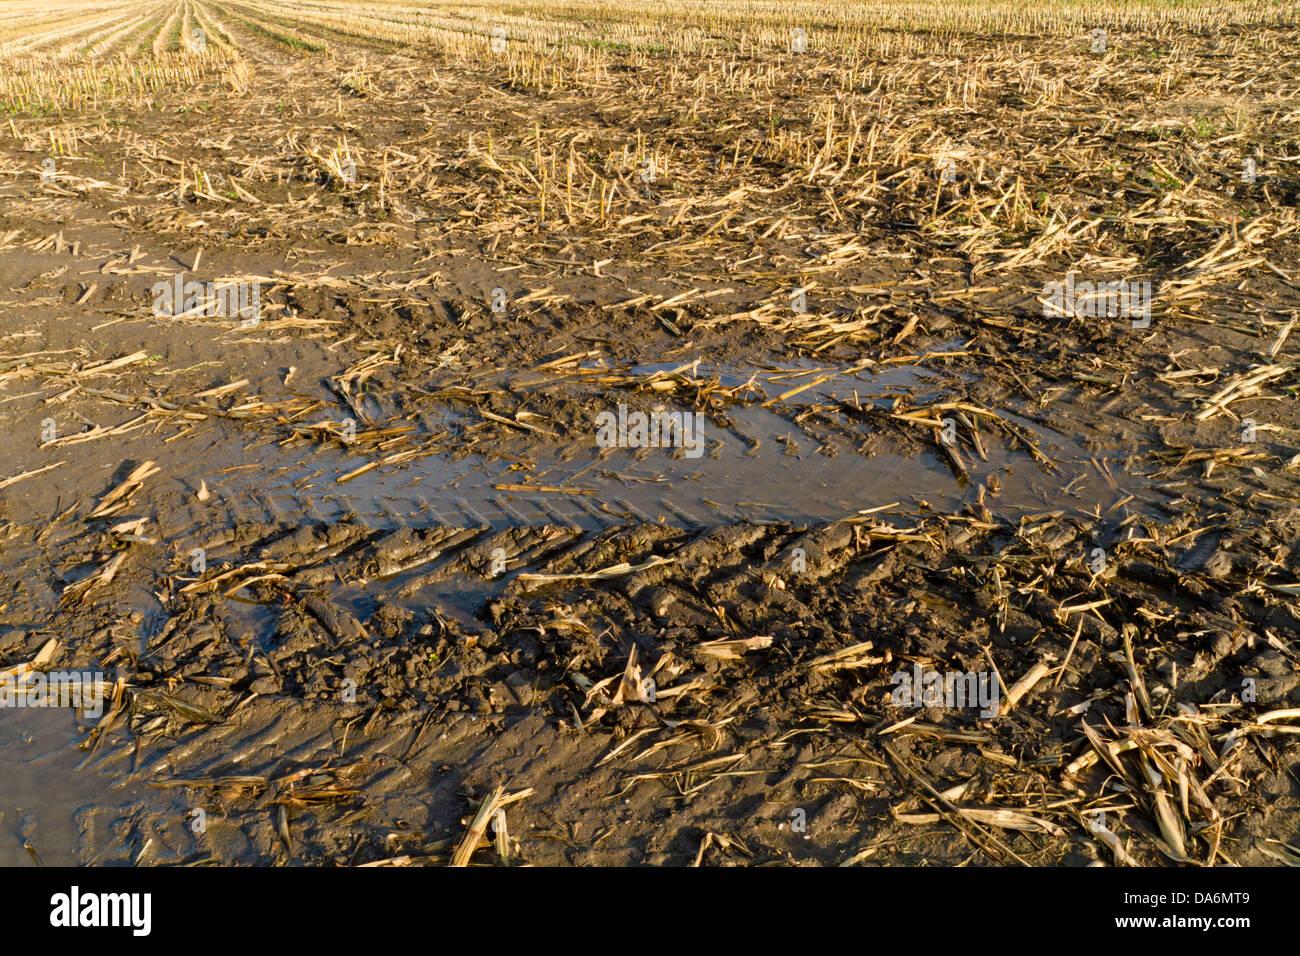 Tyre tracks on a muddy field, England, UK - Stock Image